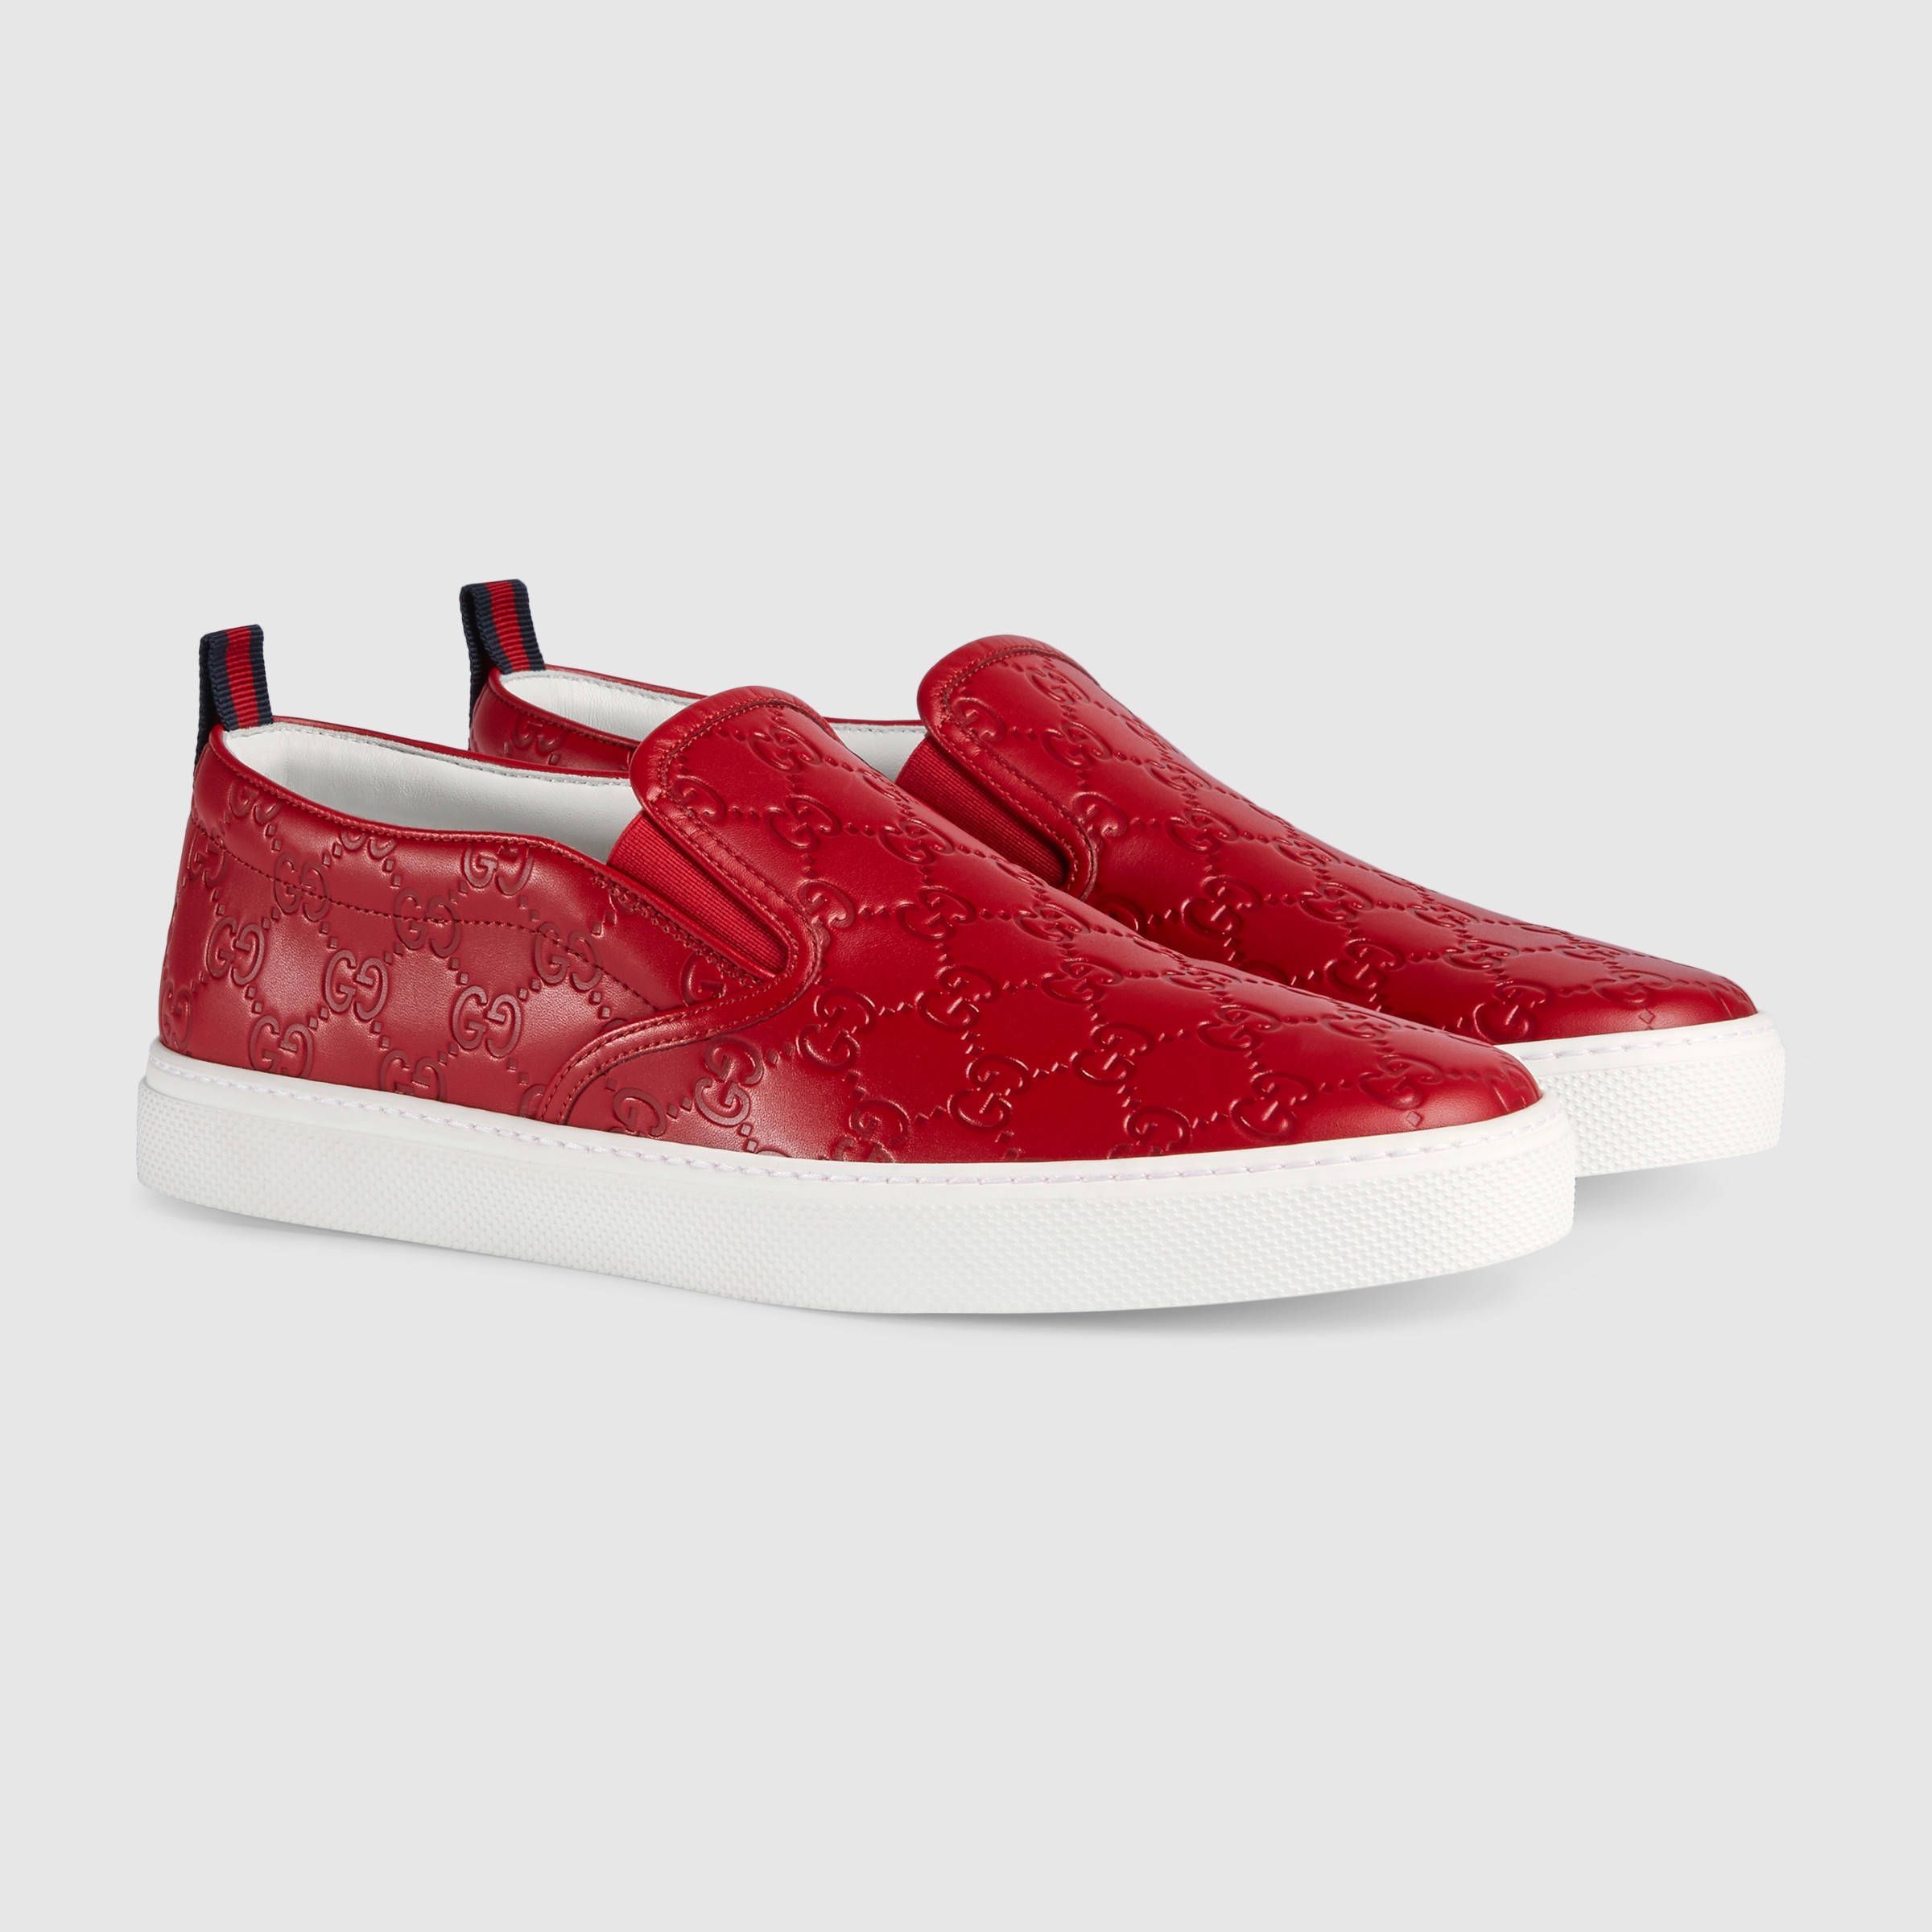 7d24d83e21014 Gucci Gucci Signature slip-on sneaker Detail 2